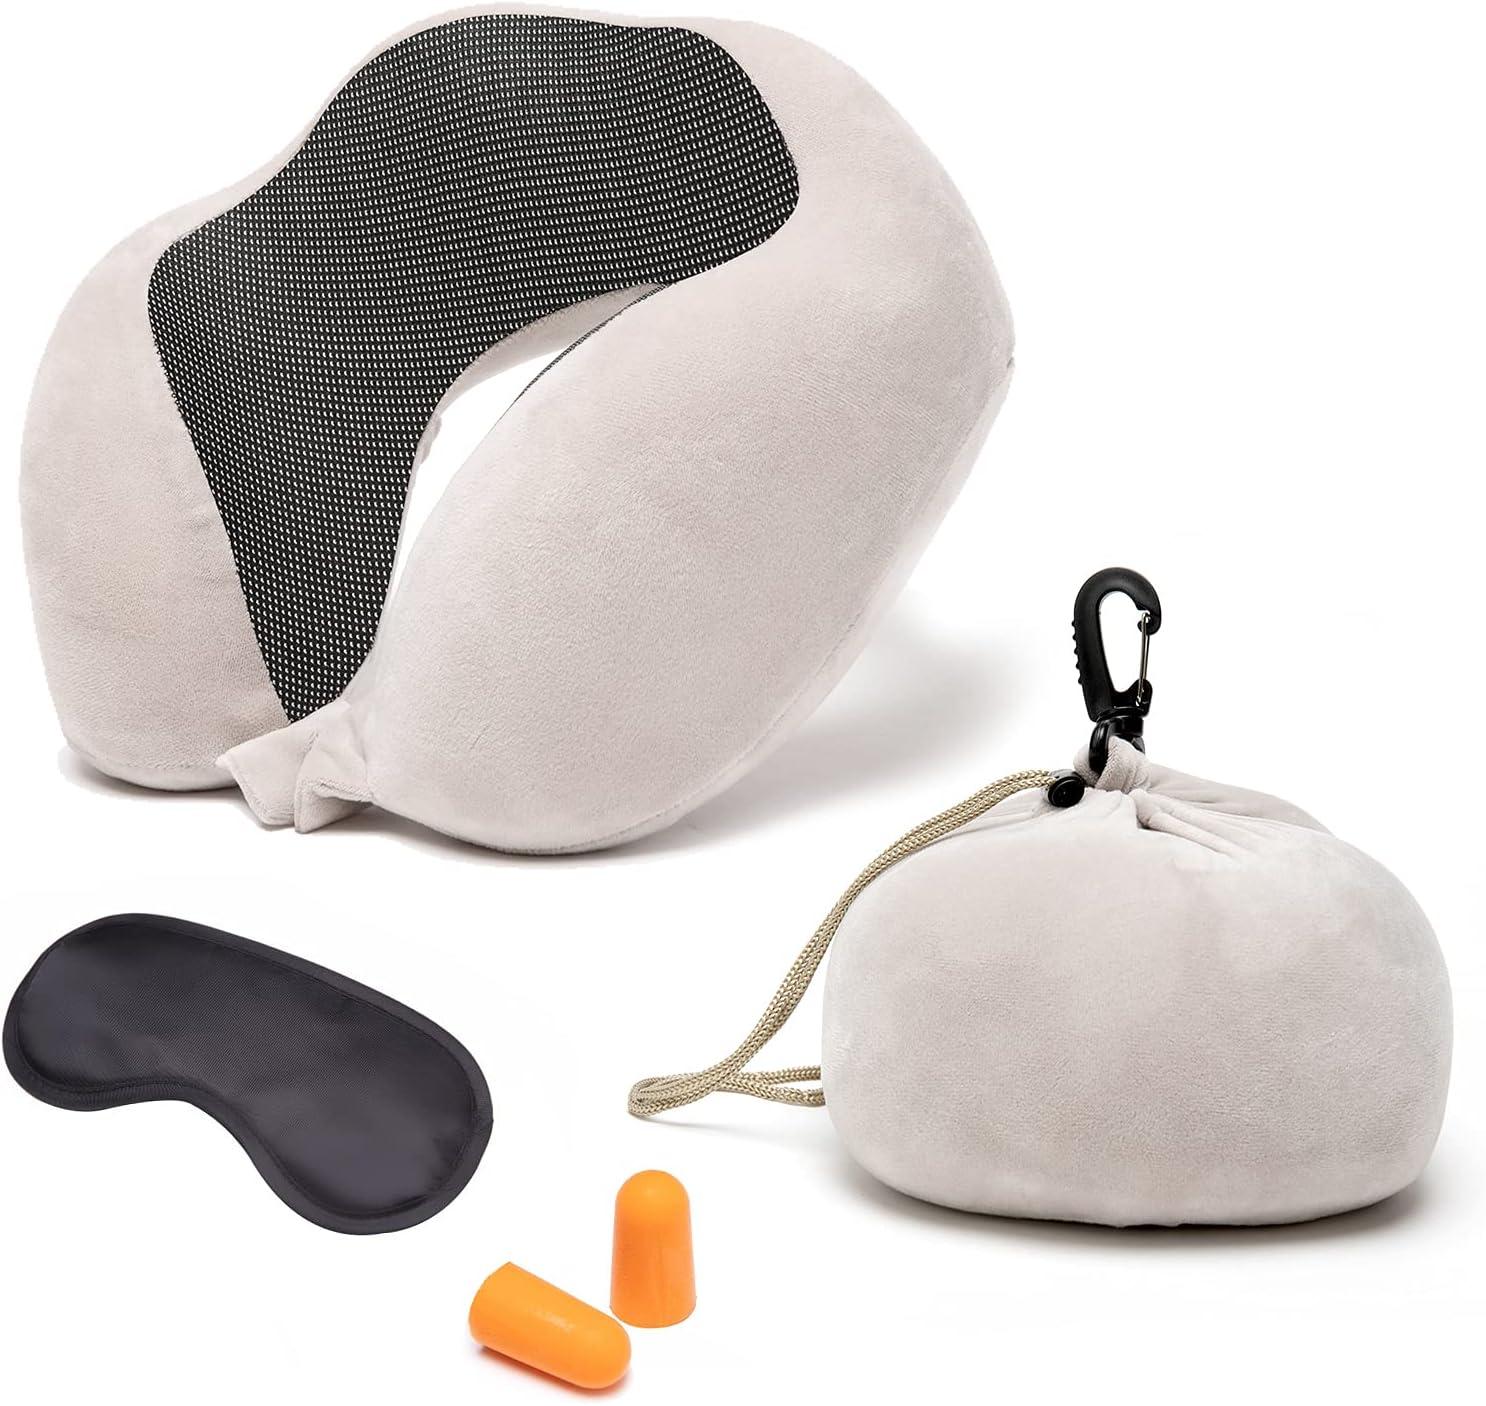 Lieyimnpilow Save money Travel Pillow Max 83% OFF Memory Foam Pillo Neck Support Head